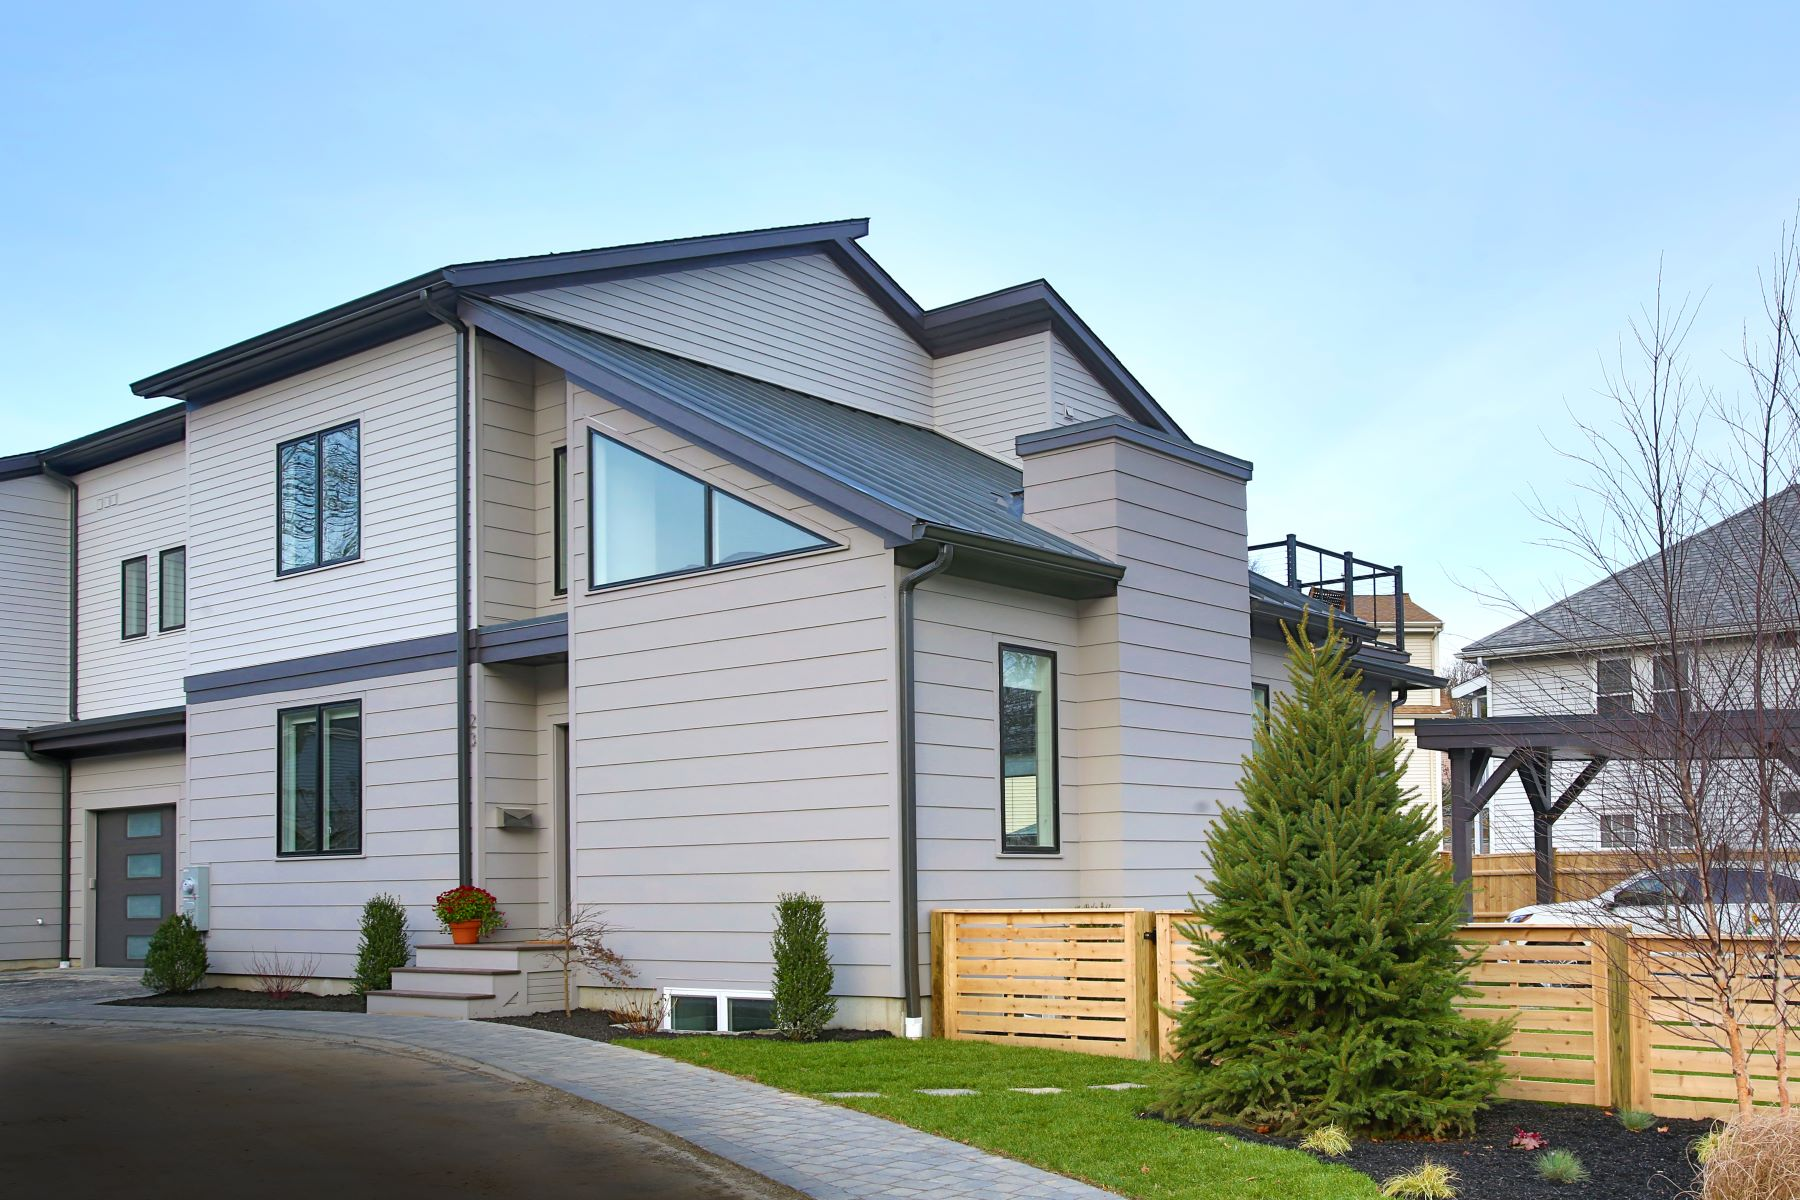 Single Family Home for Active at 23 Auburndale Ave Newton, Massachusetts 02465 United States